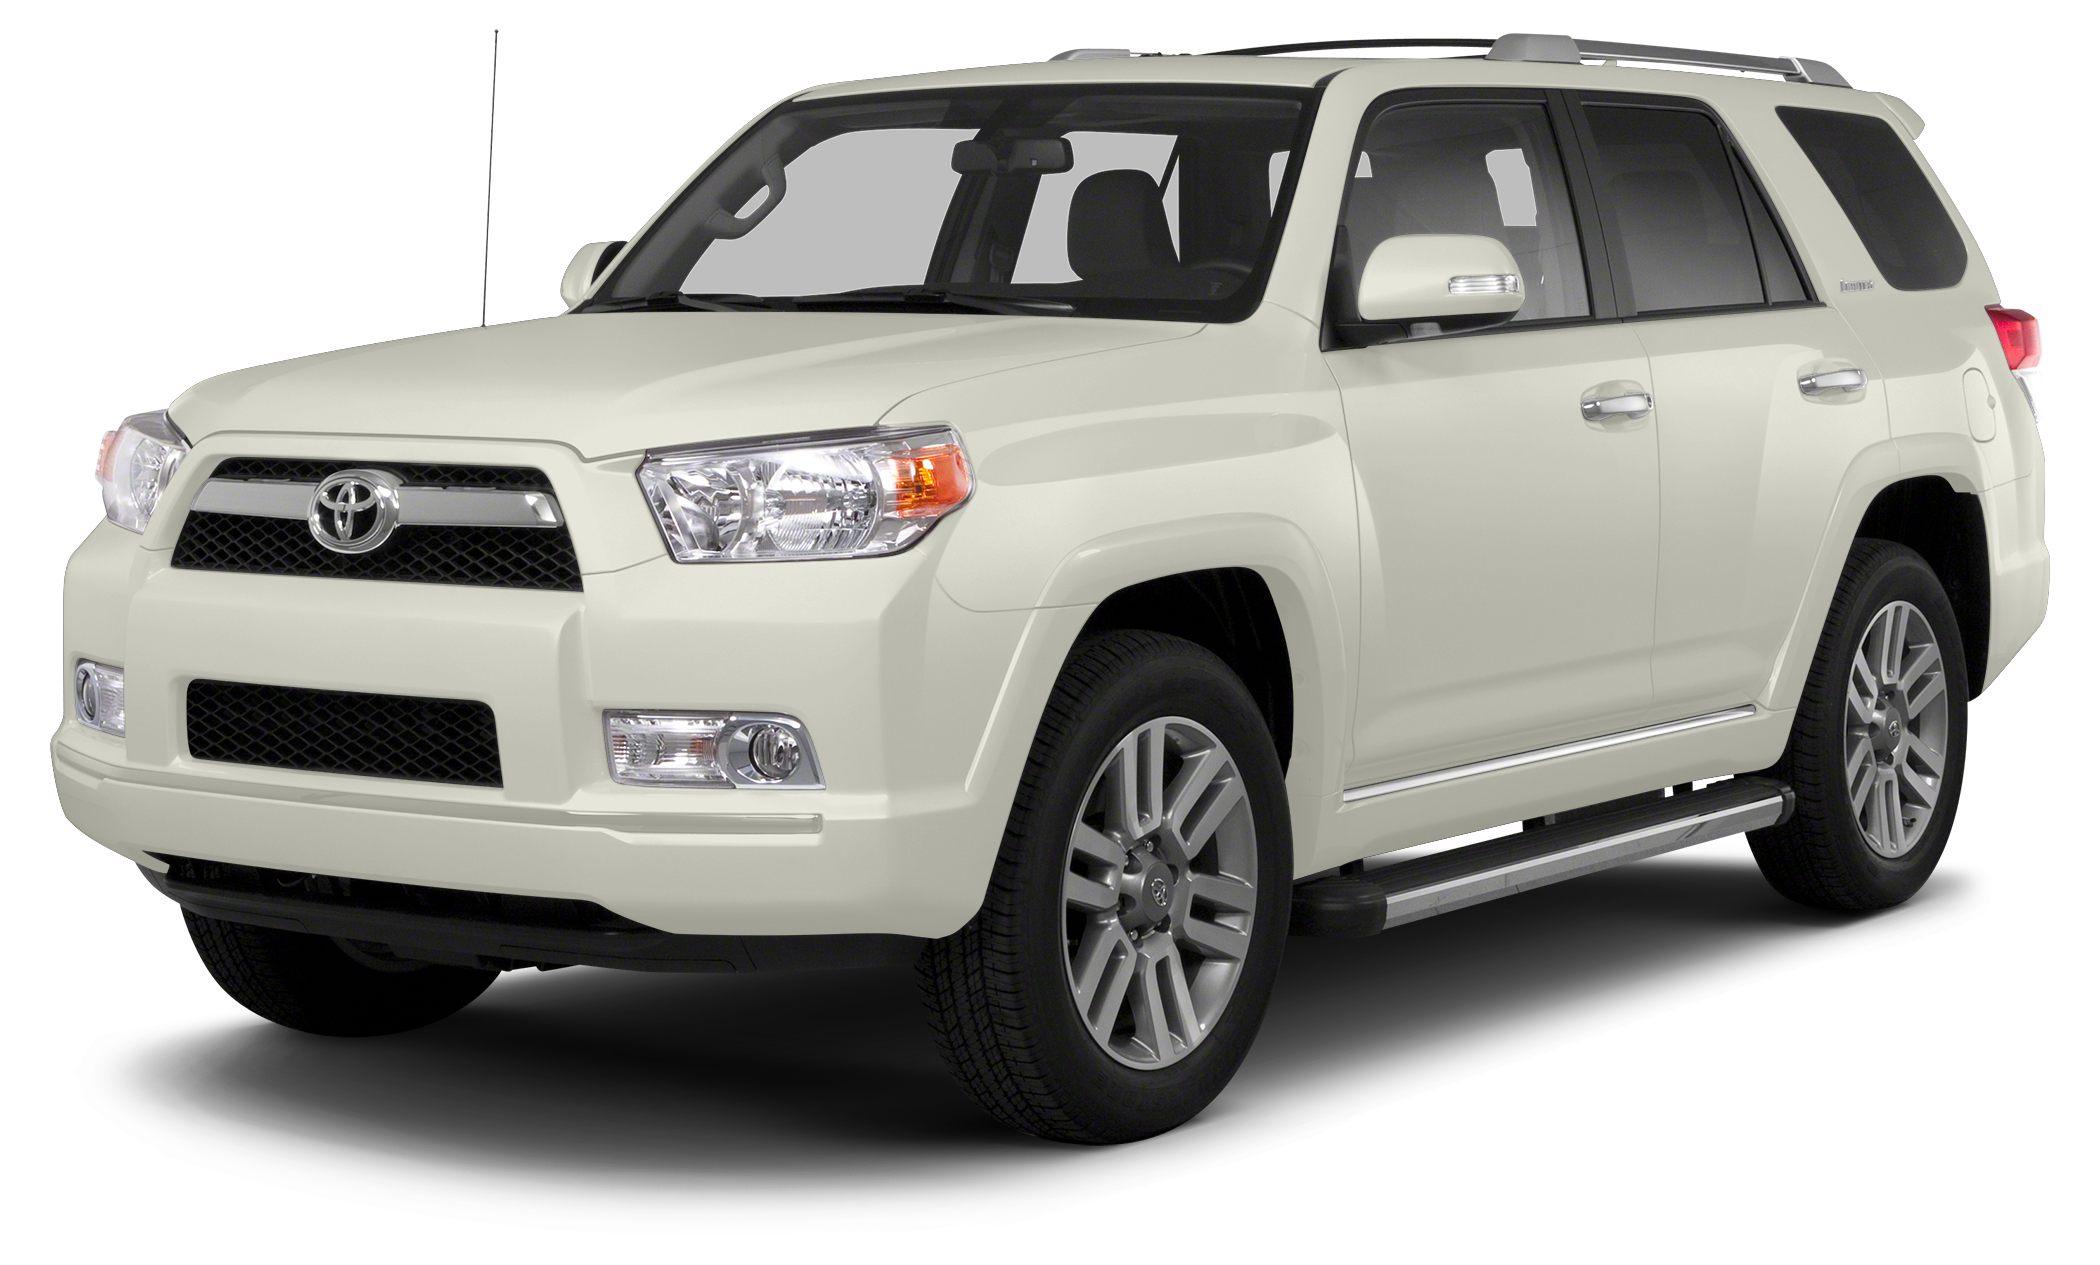 2013 Toyota 4Runner SR5 CARFAX 1-Owner 12000 Mile Warranty LOW MILES - 14284 800 below Kelley